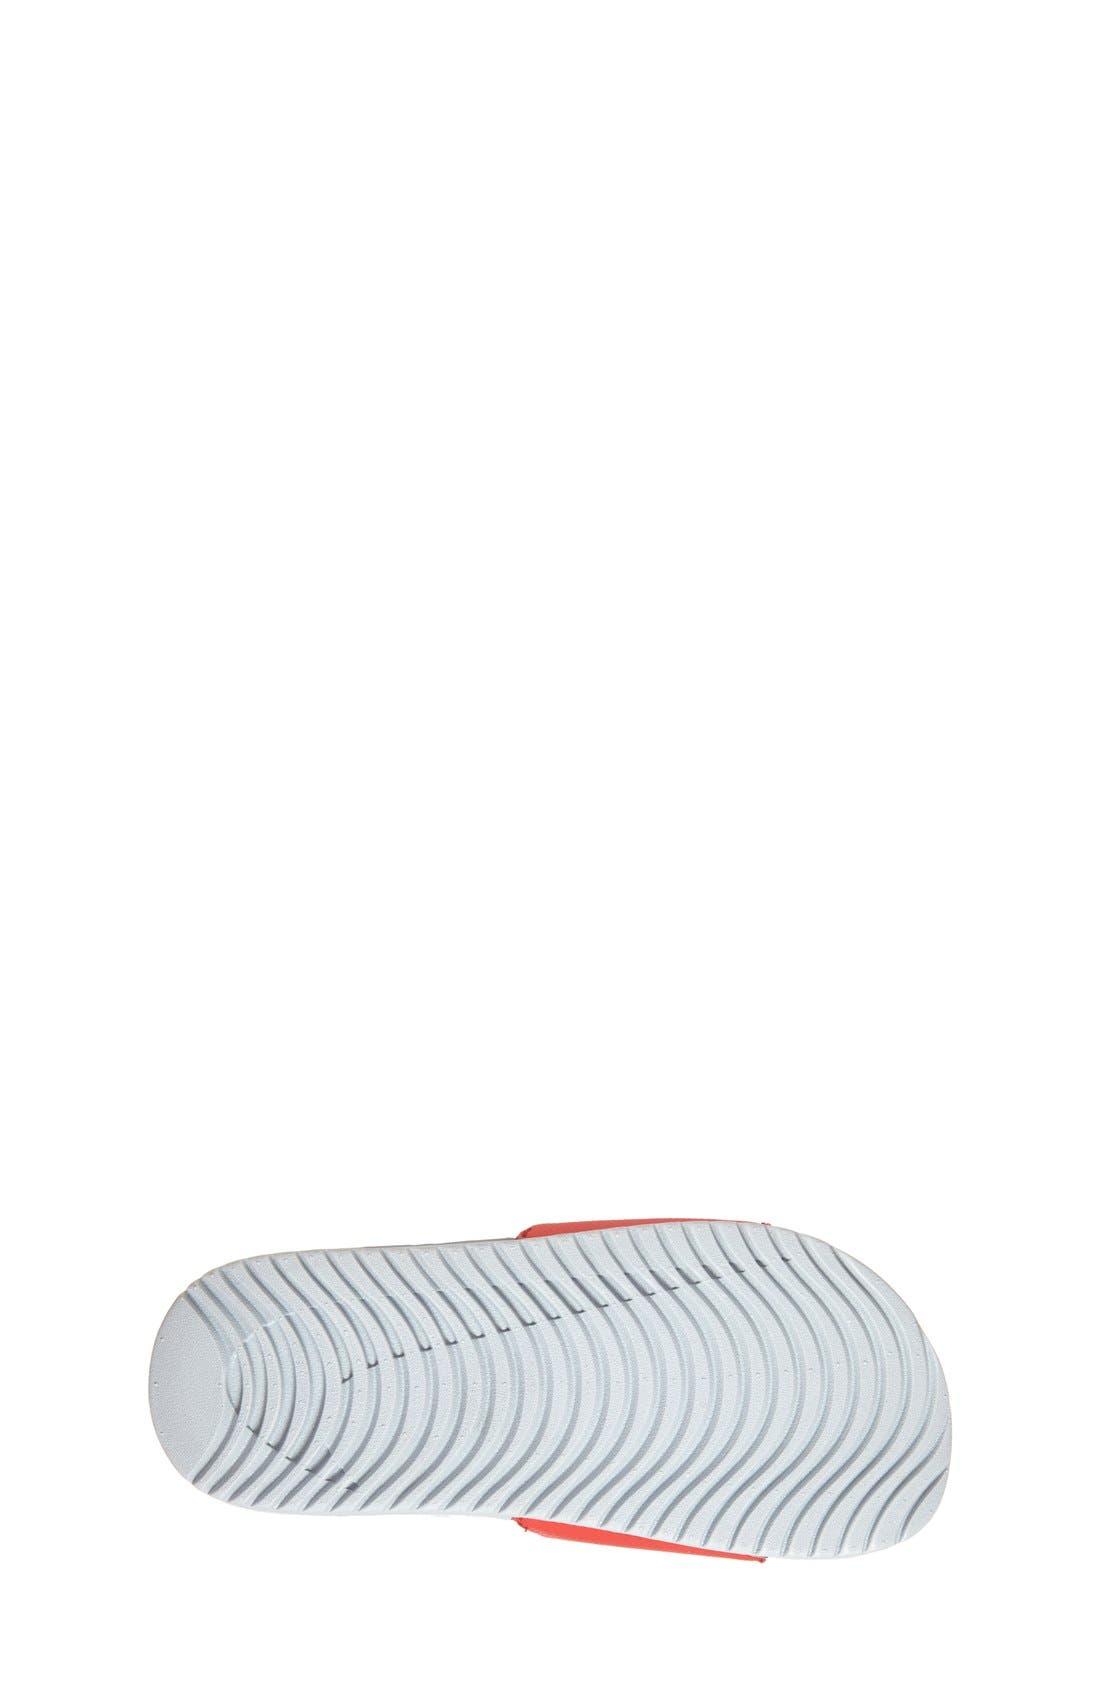 'Kawa' Slide Sandal,                             Alternate thumbnail 4, color,                             UNIVERSITY RED/ WHITE